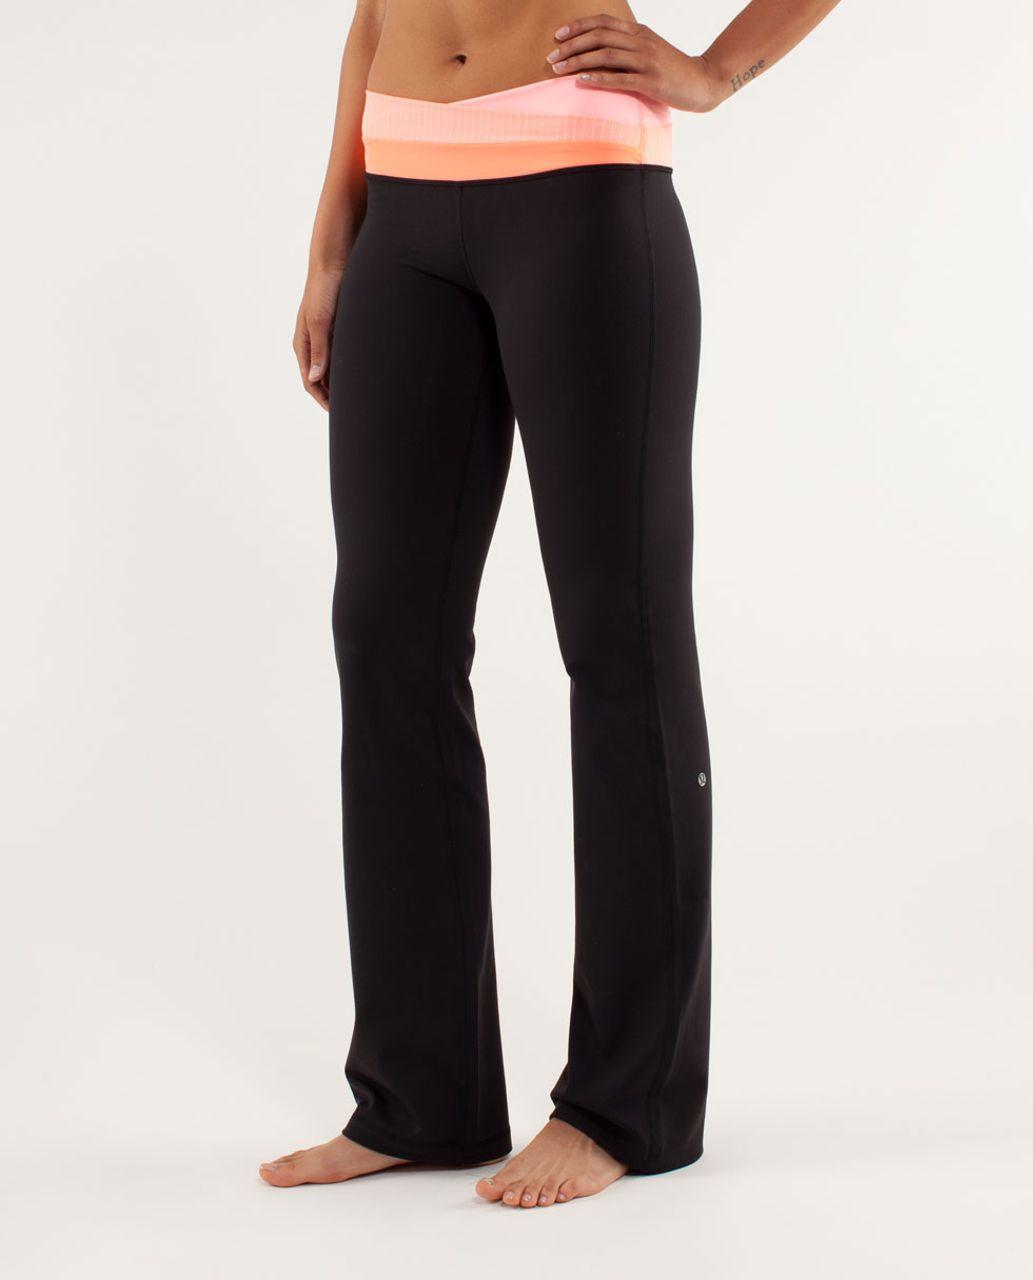 Lululemon Astro Pant (Regular) - Black / Bleached Coral / Pop Orange